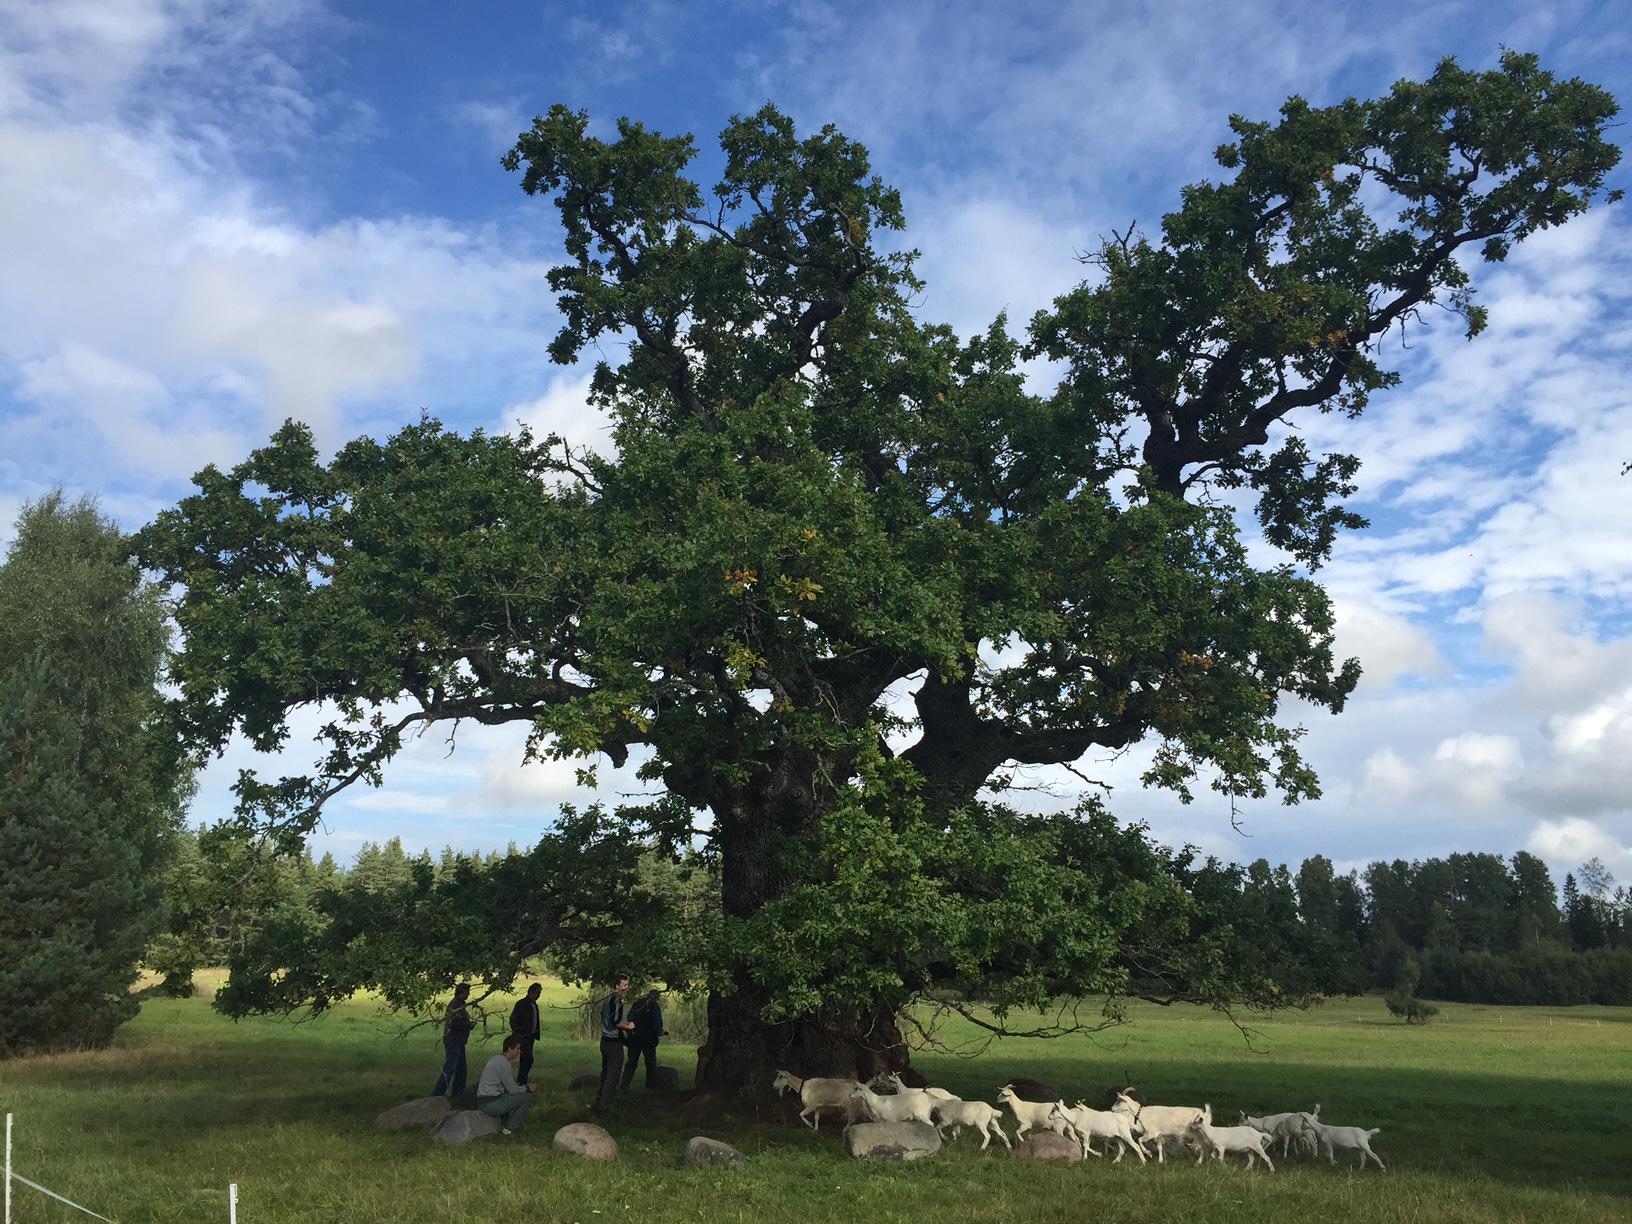 oak hill buddhist single men Find buddhist therapists,  oak hill adams arrington burns centerville  family/social relationships, divorce/breakup, dating, parenting.